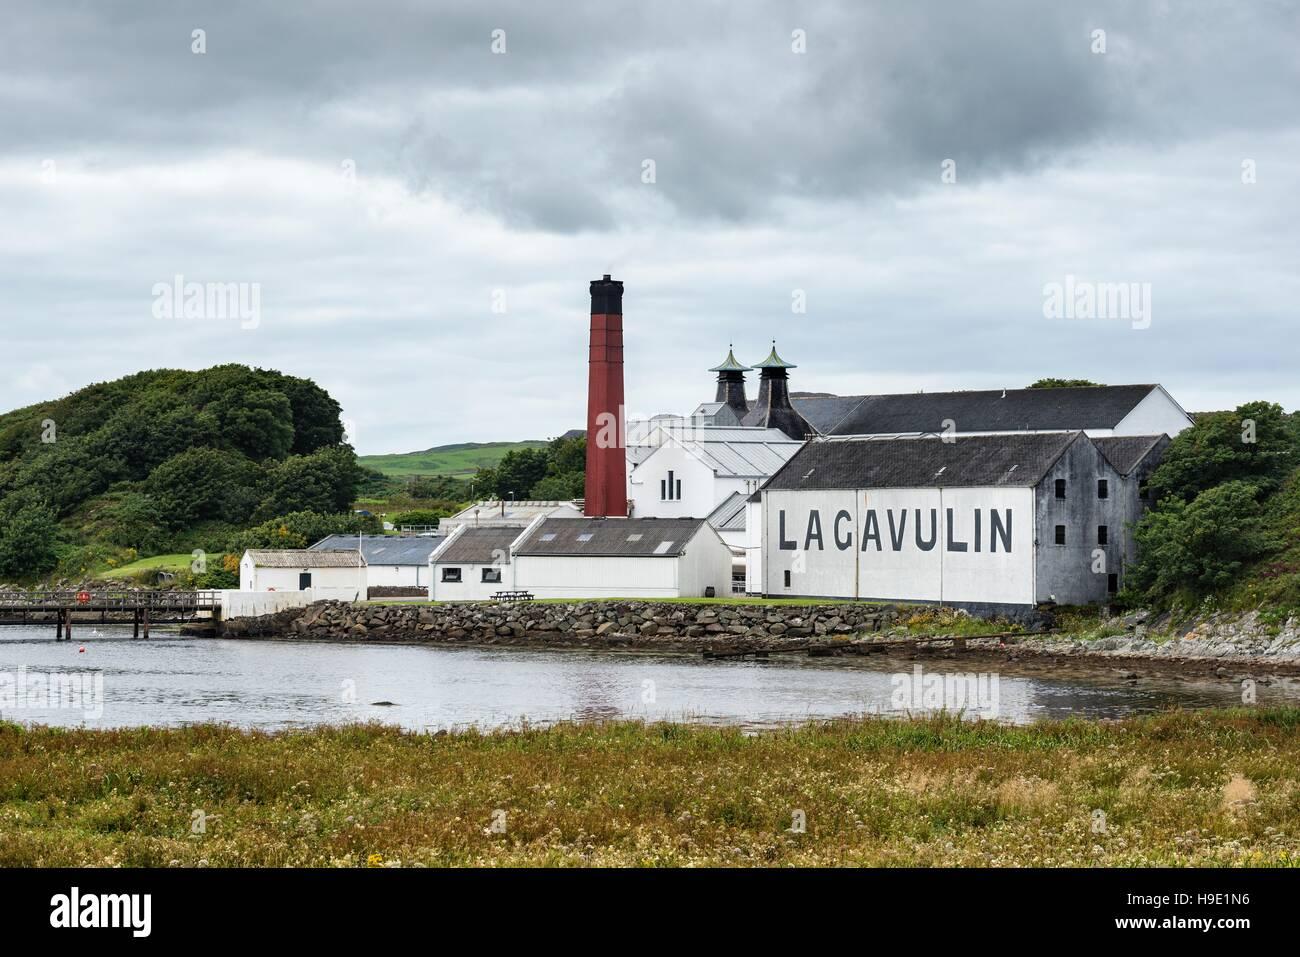 Lagavulin whiskey distillery, Islay, Inner Hebrides, Scotland, United Kingdom - Stock Image